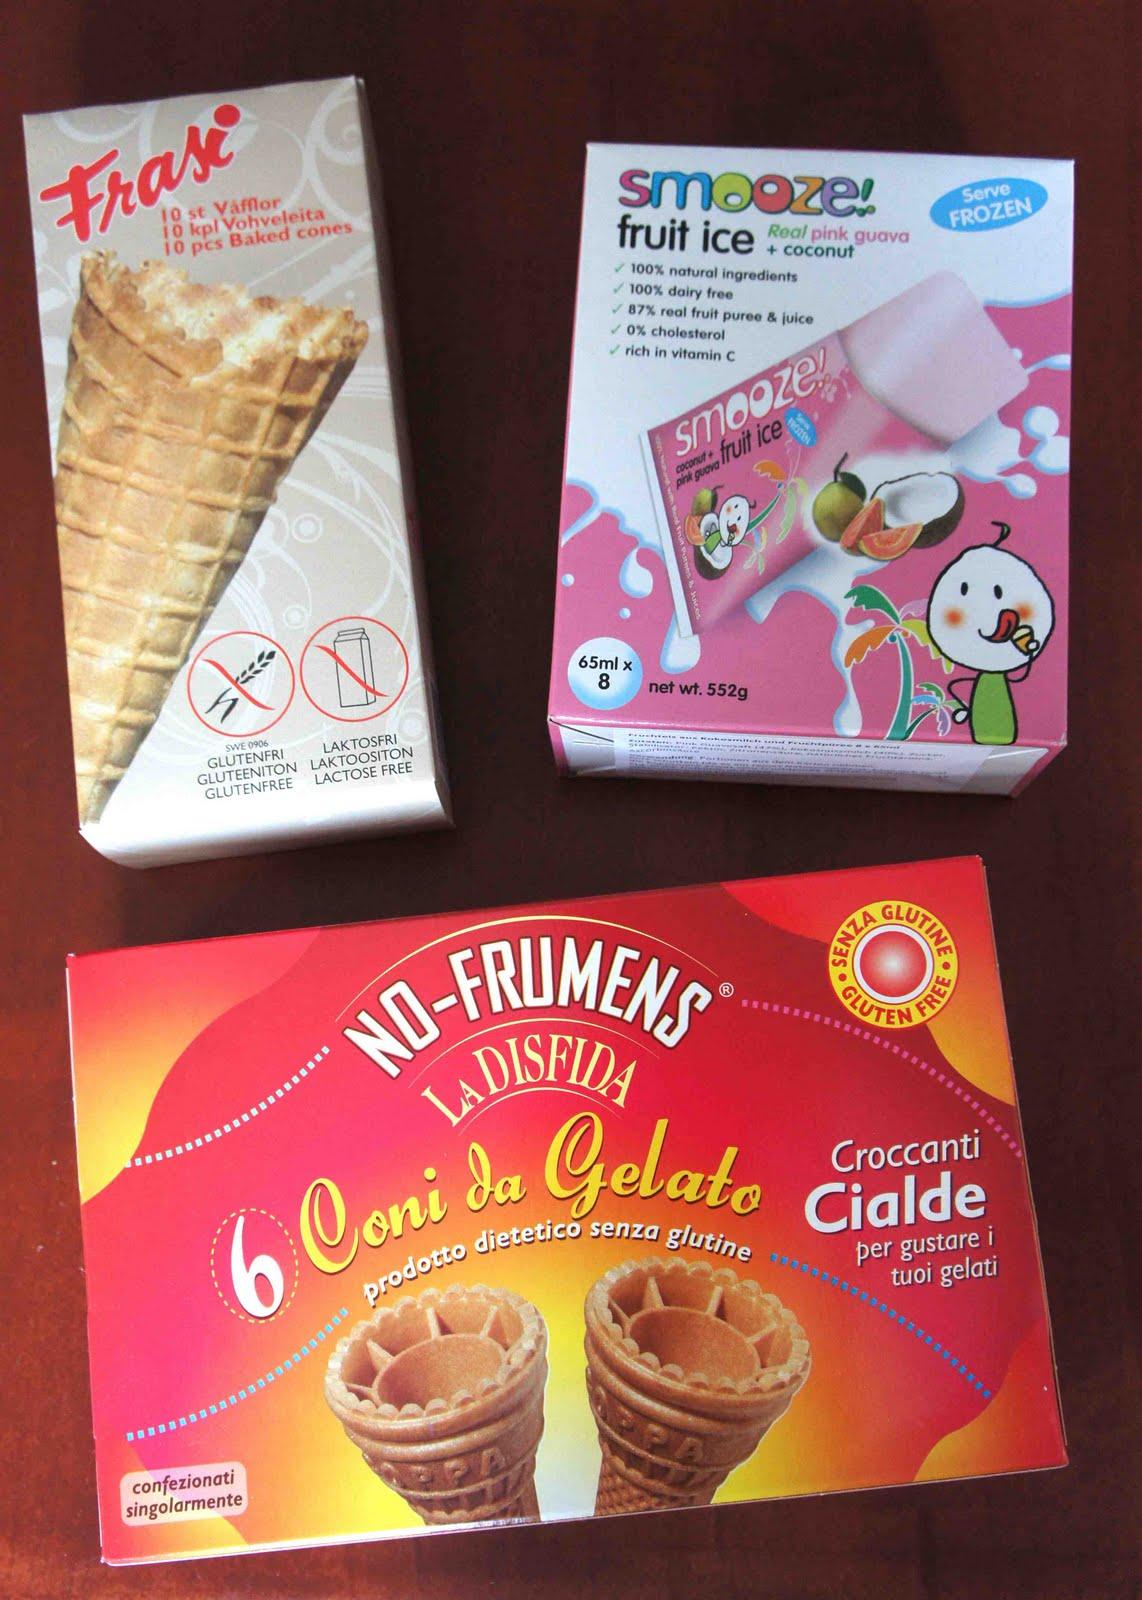 links: Coni da Gelato / rechts: Frasi